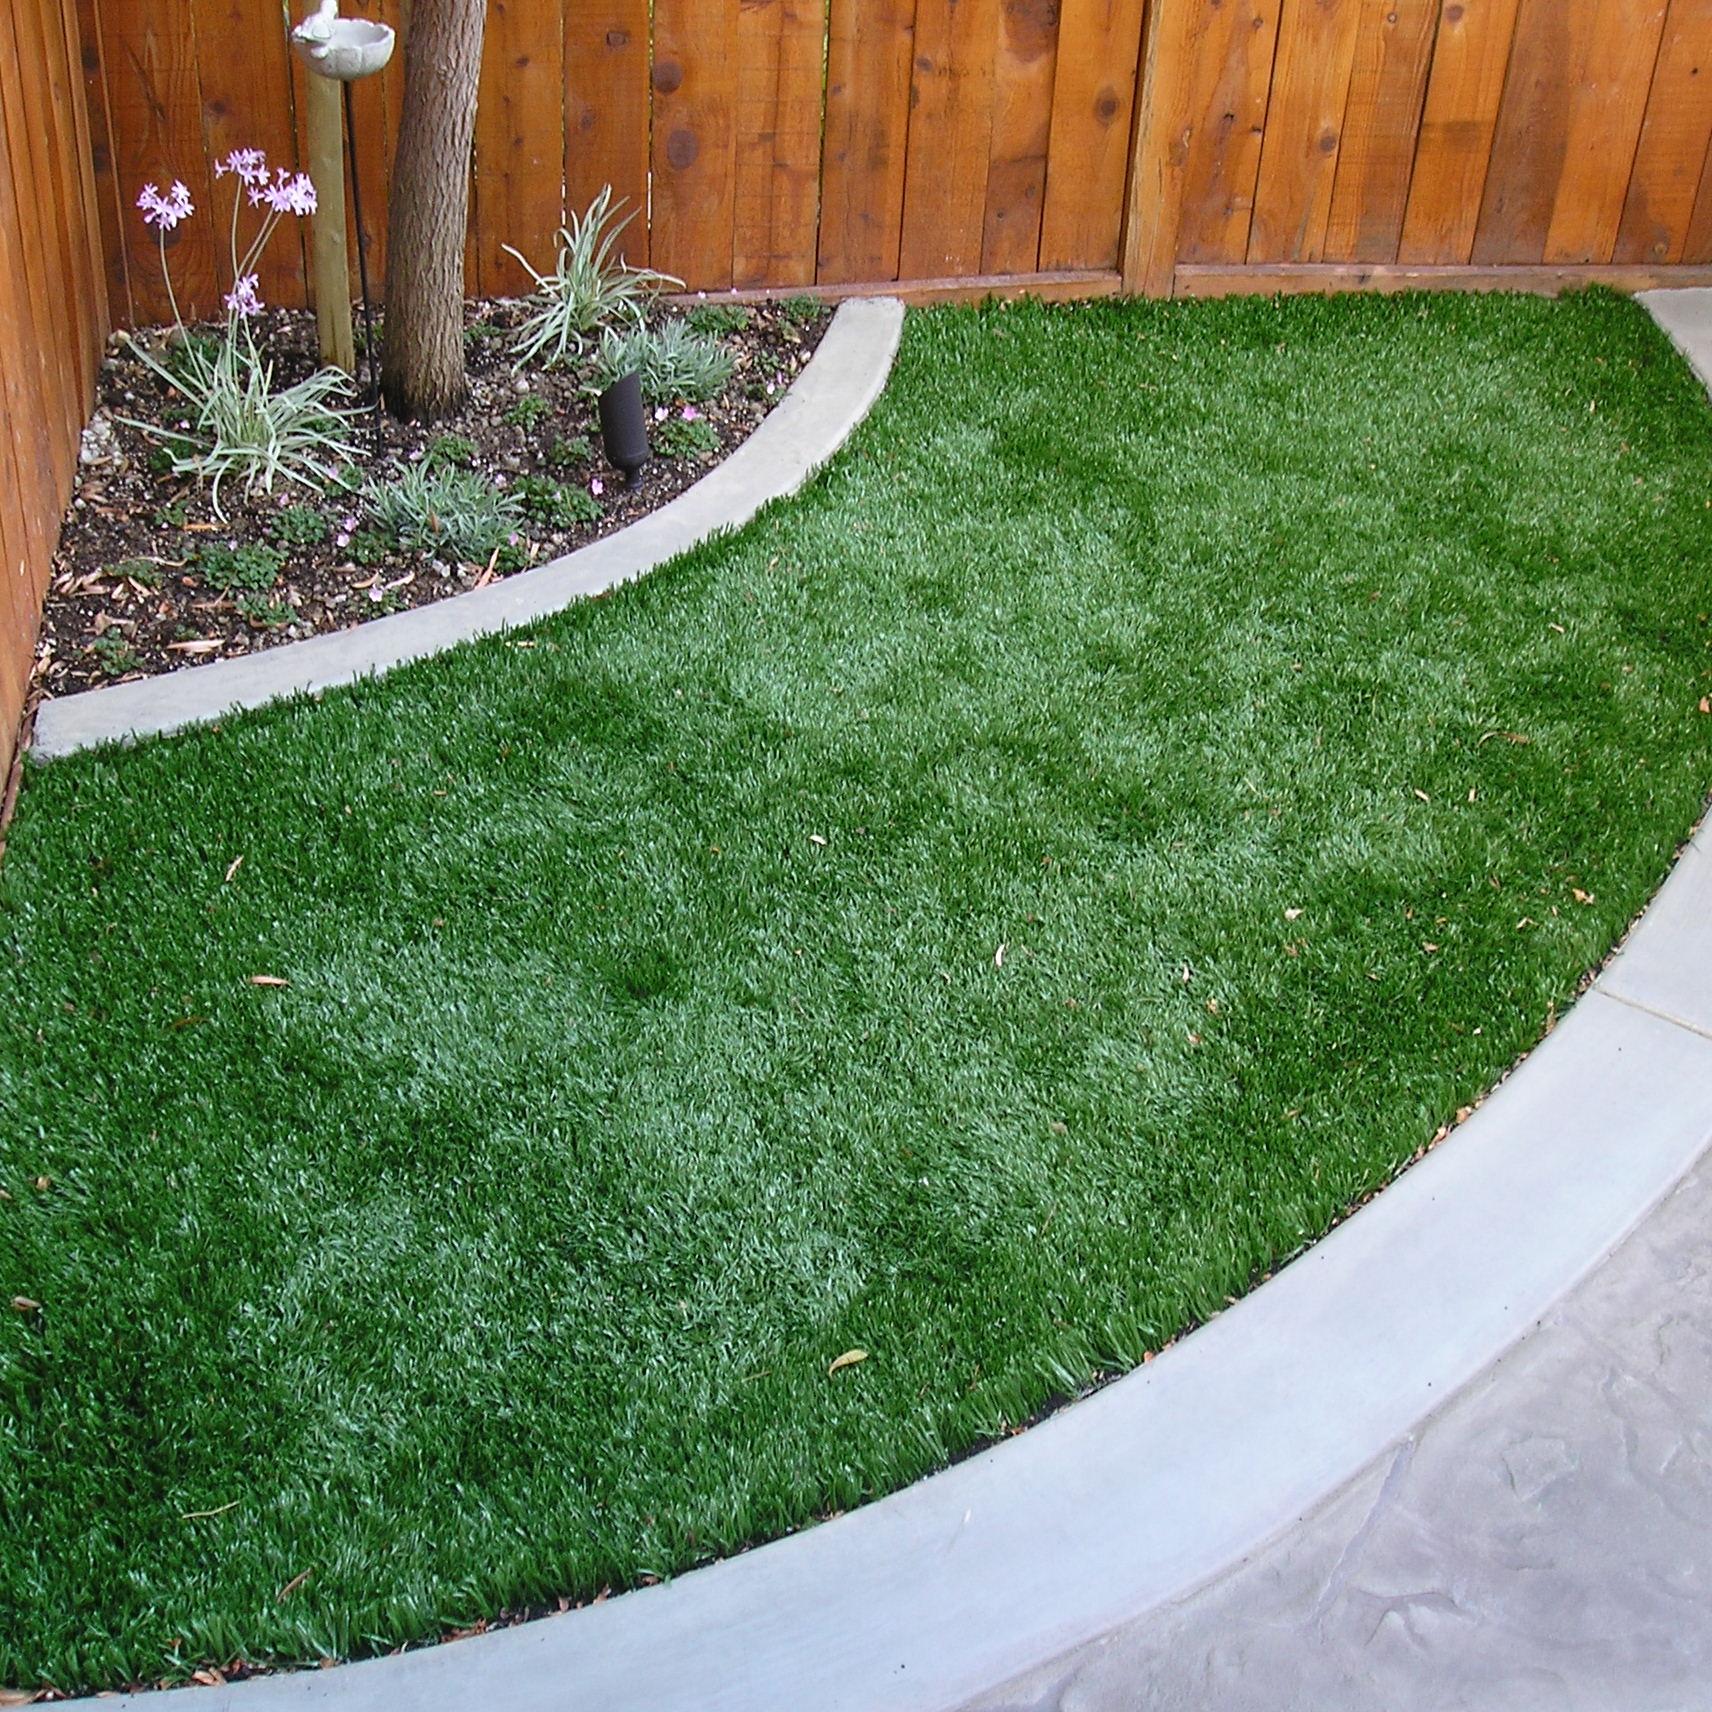 S Blade 50 fake grass for yard,backyard turf,turf backyard,turf yard,fake grass for backyard